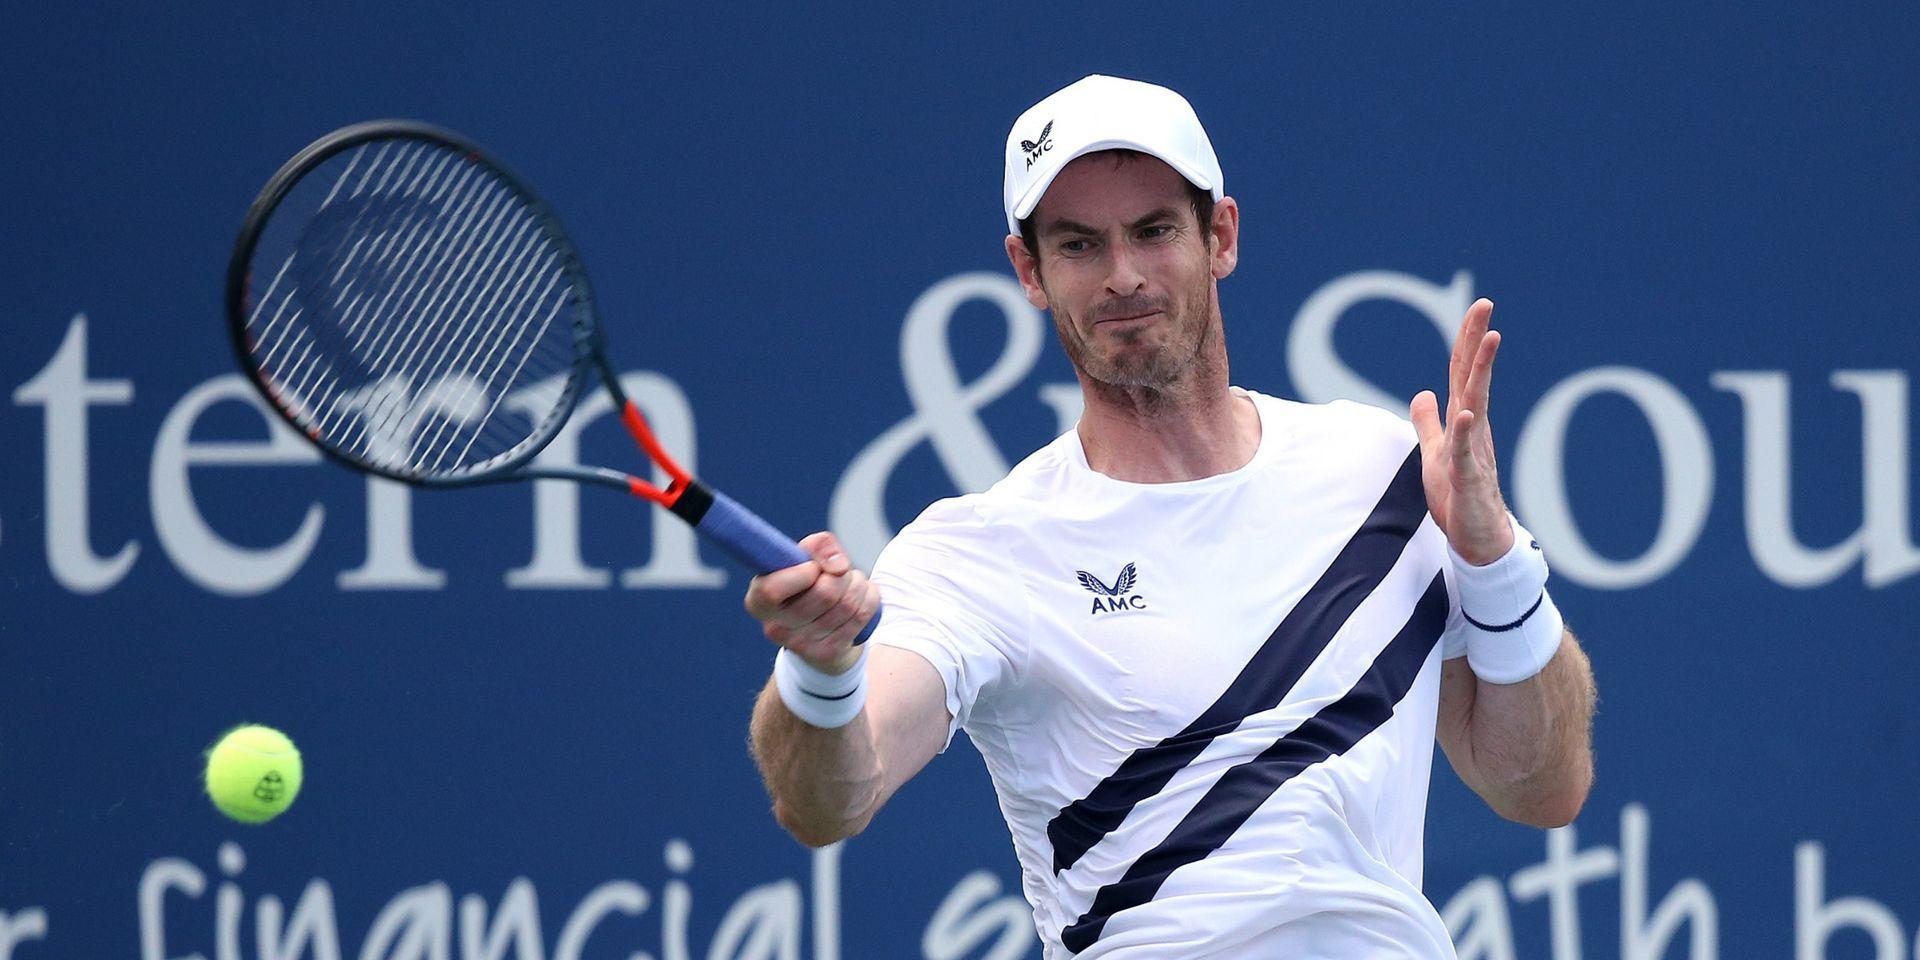 ATP Cincinnati: Andy Murray qualifié pour le 2e tour à Cincinnati